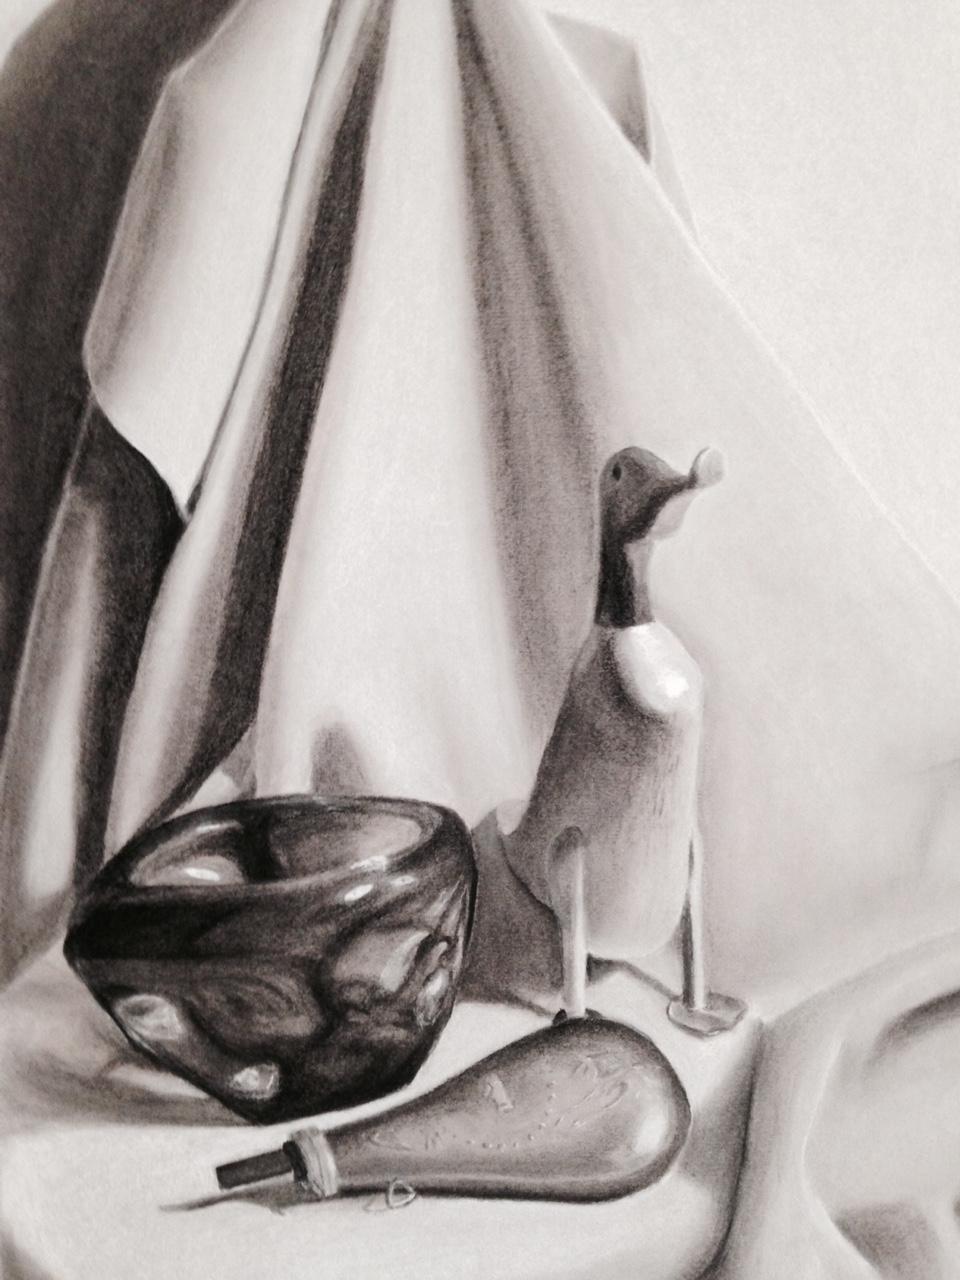 B&W on Gray by Al Schofield